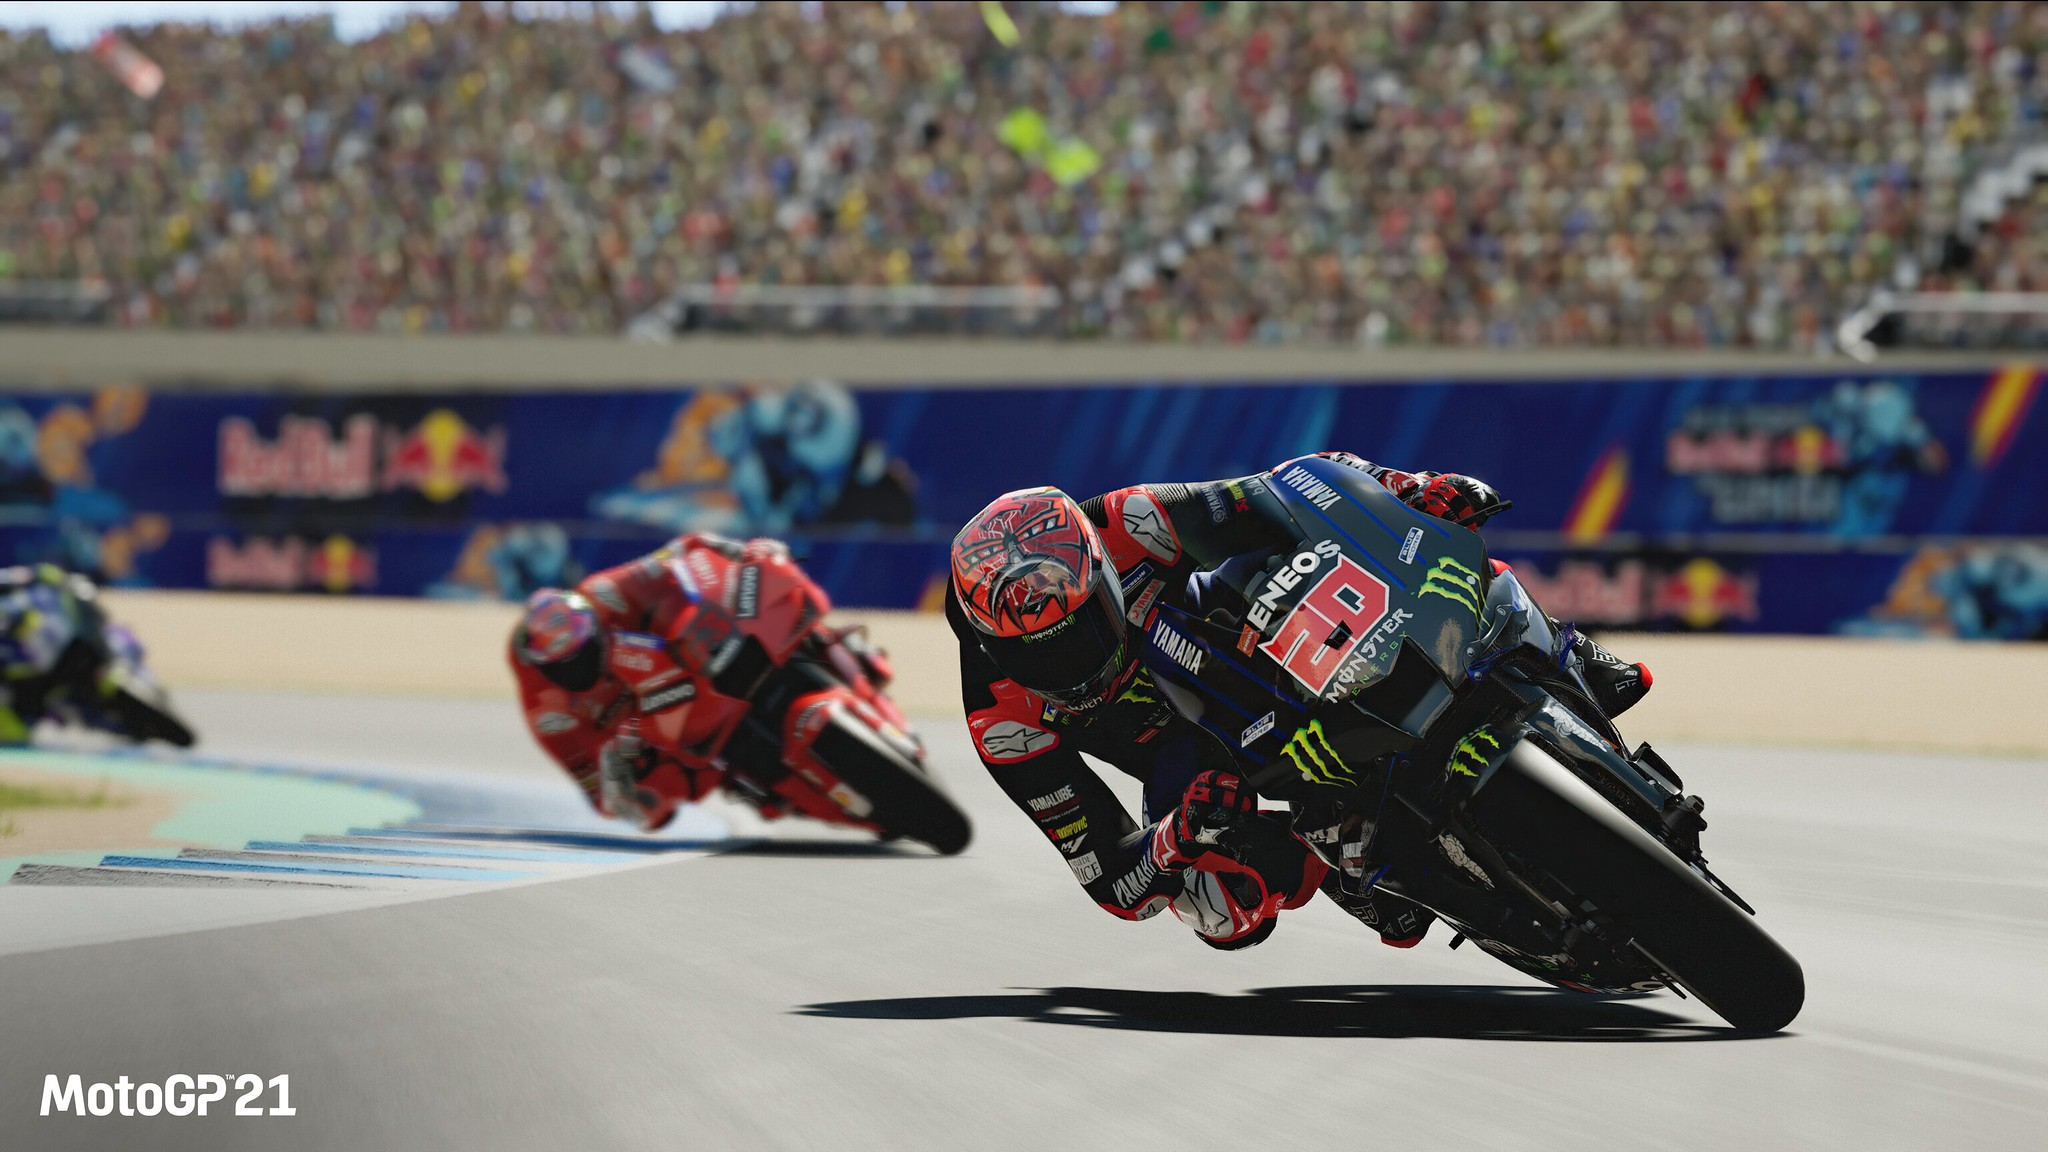 MotoGP-Pure-Gameplay-01-4K-1